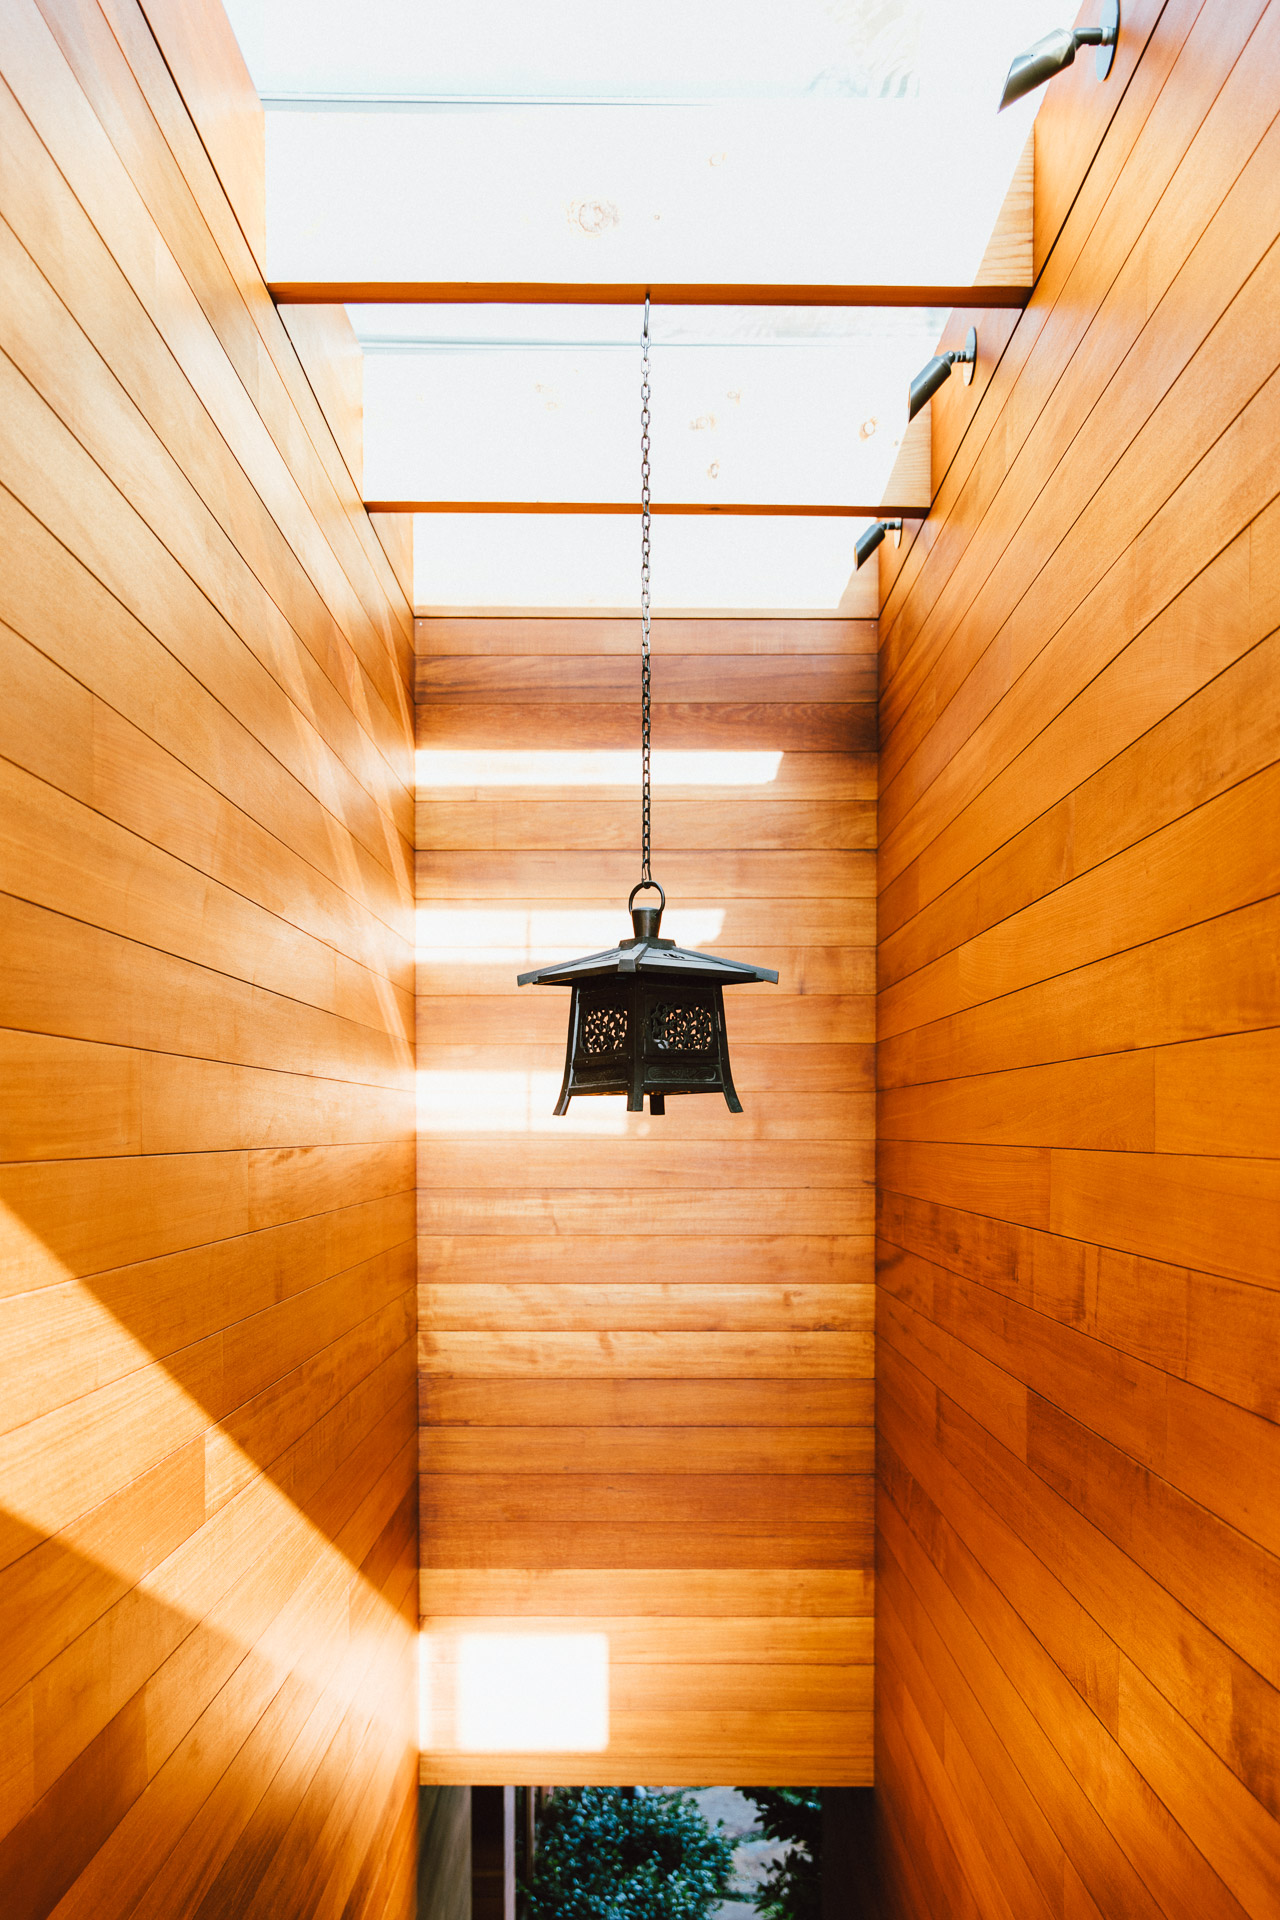 nobu-ryokan-malibu-california-luxury-hotel-photographer-los-angeles-9.jpg